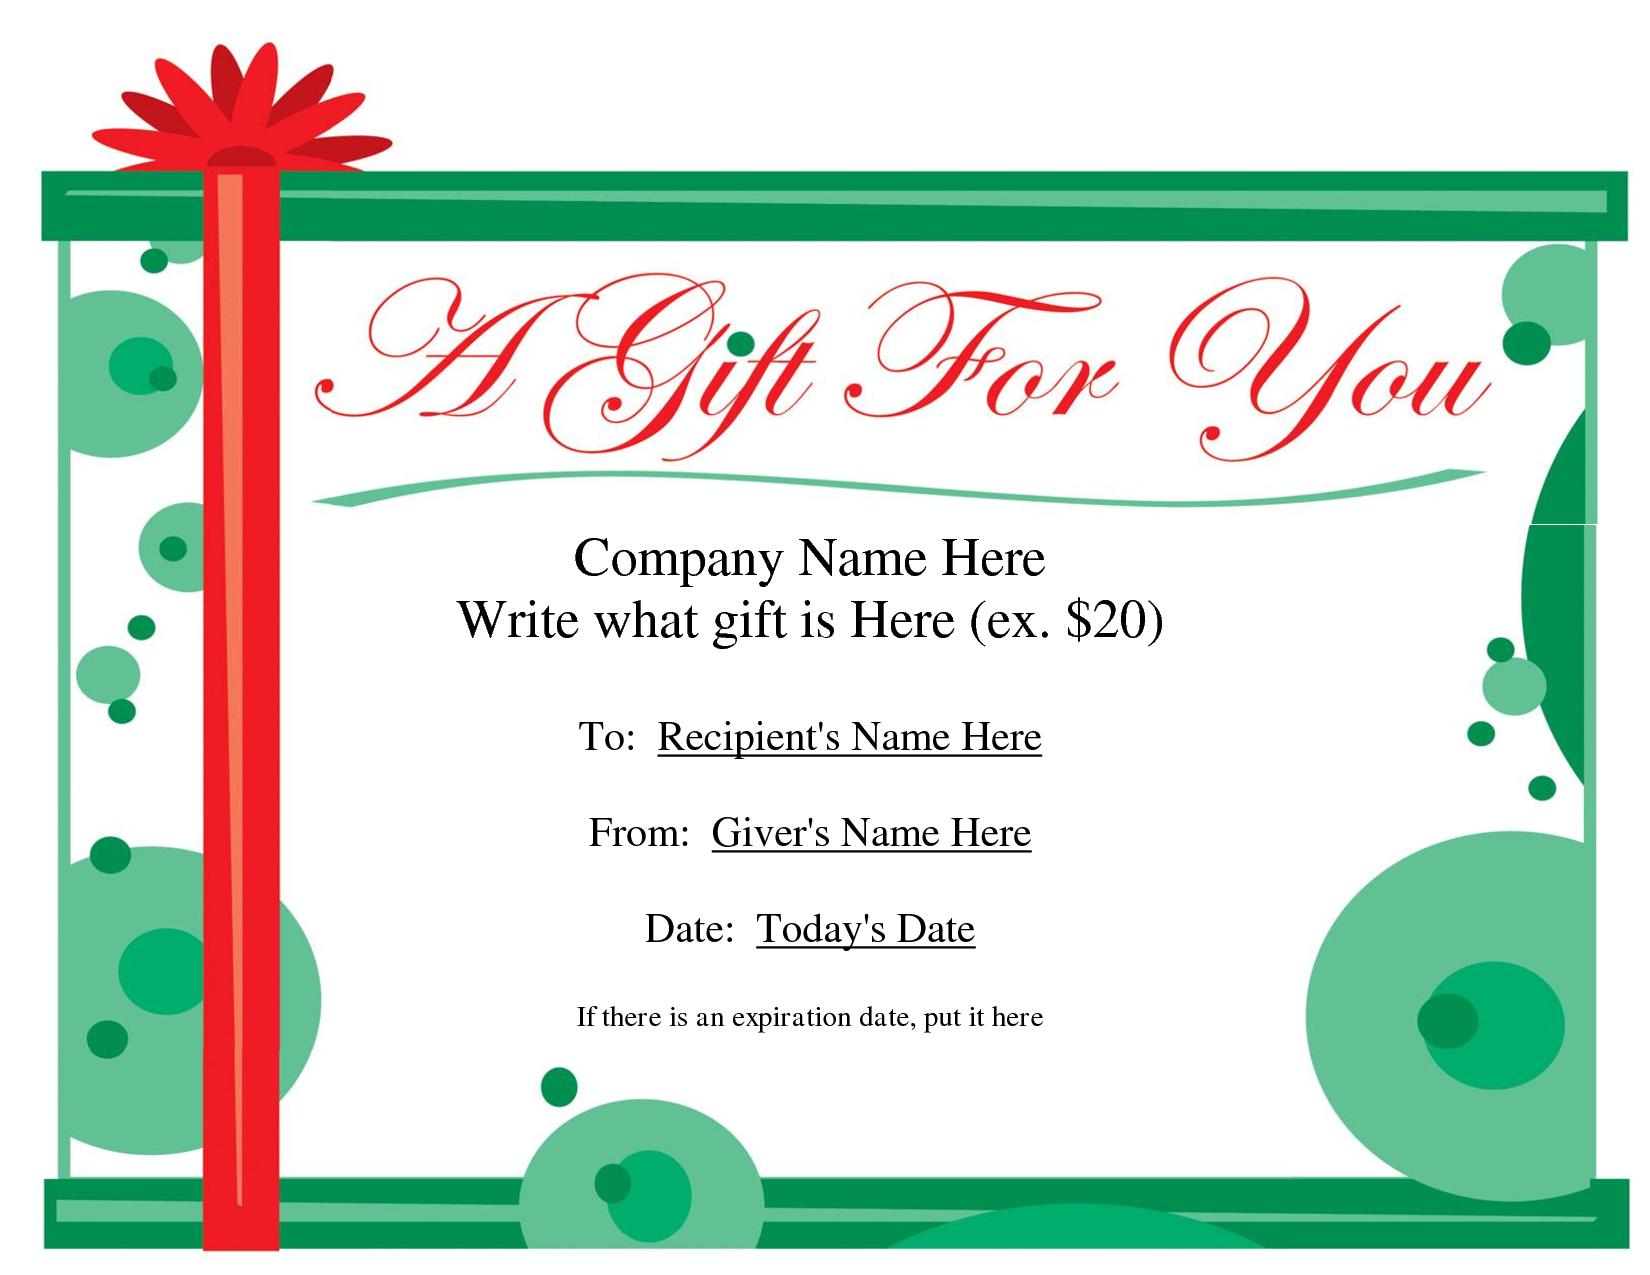 Free Christmas Gift Certificate Templates | Ideas For The House - Free Printable Gift Certificates For Hair Salon